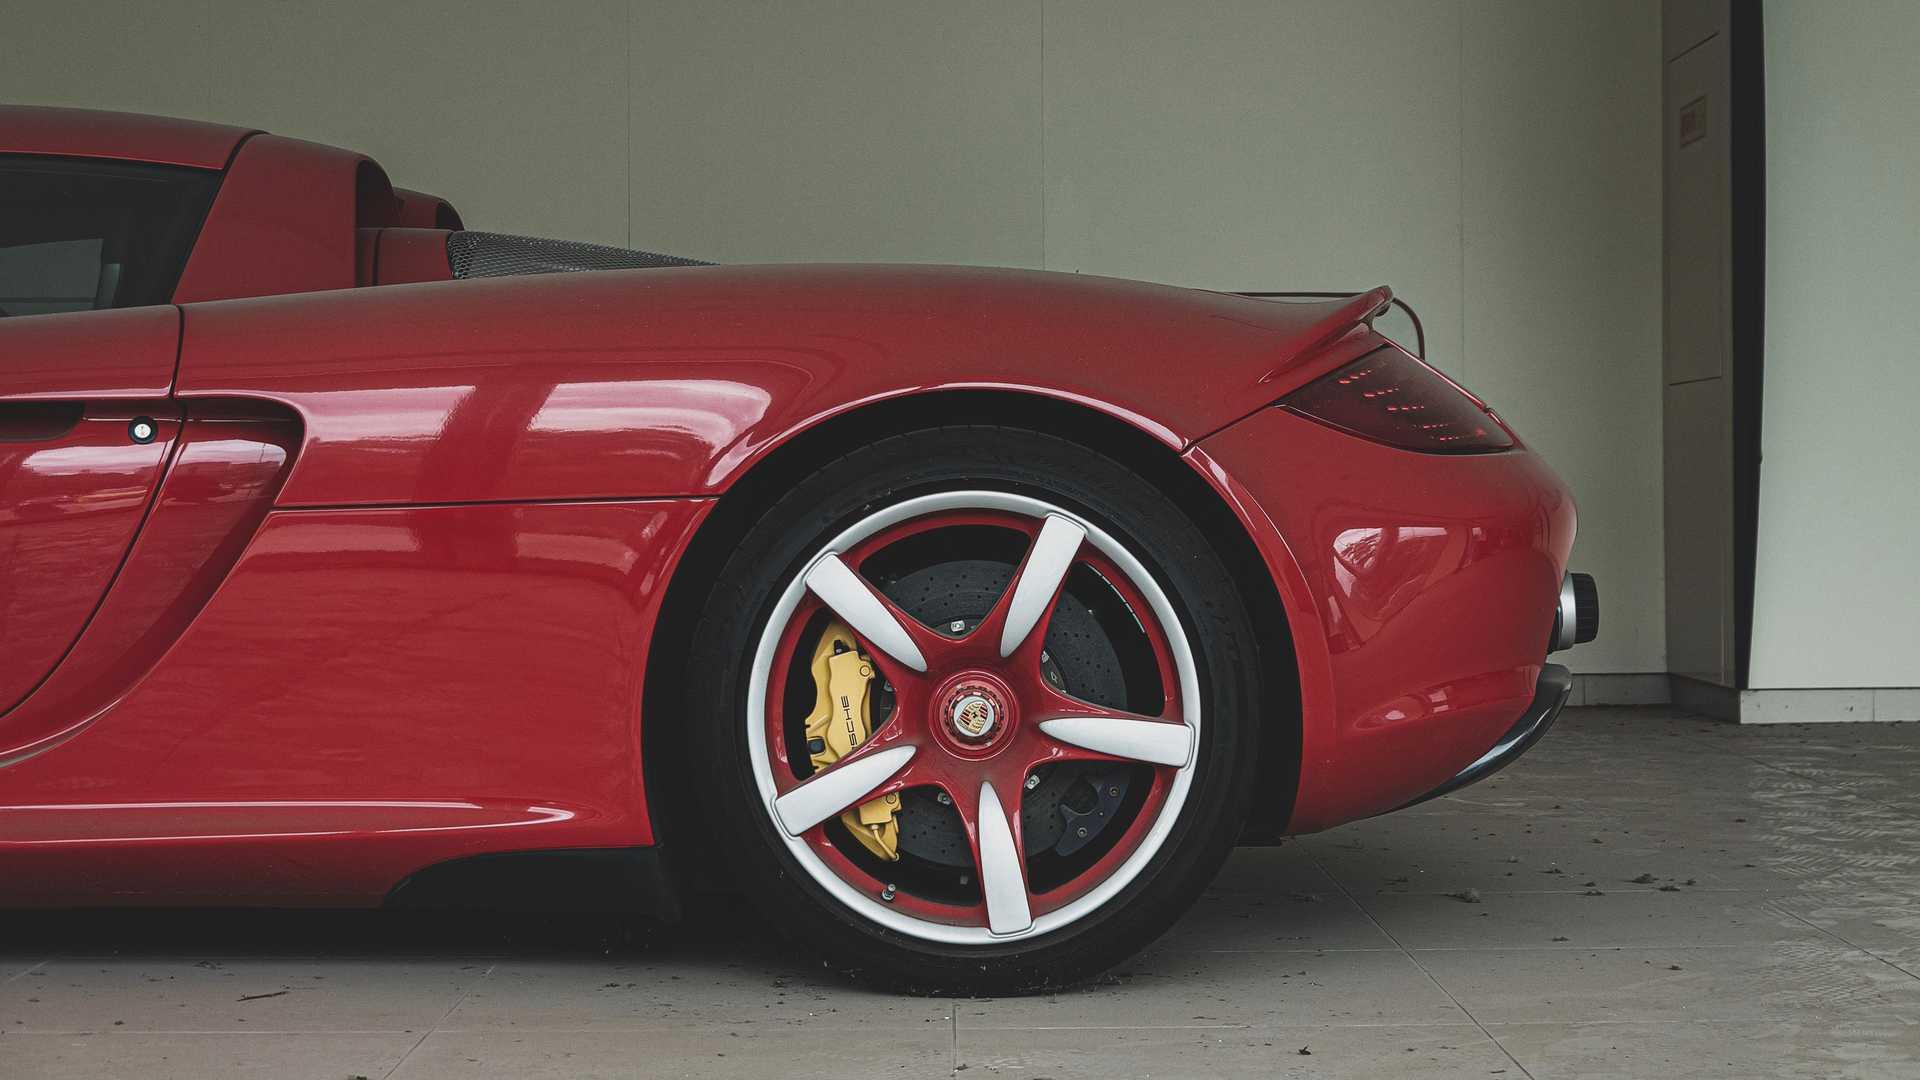 abandoned-porsche-carrera-gt-rear-side-profile